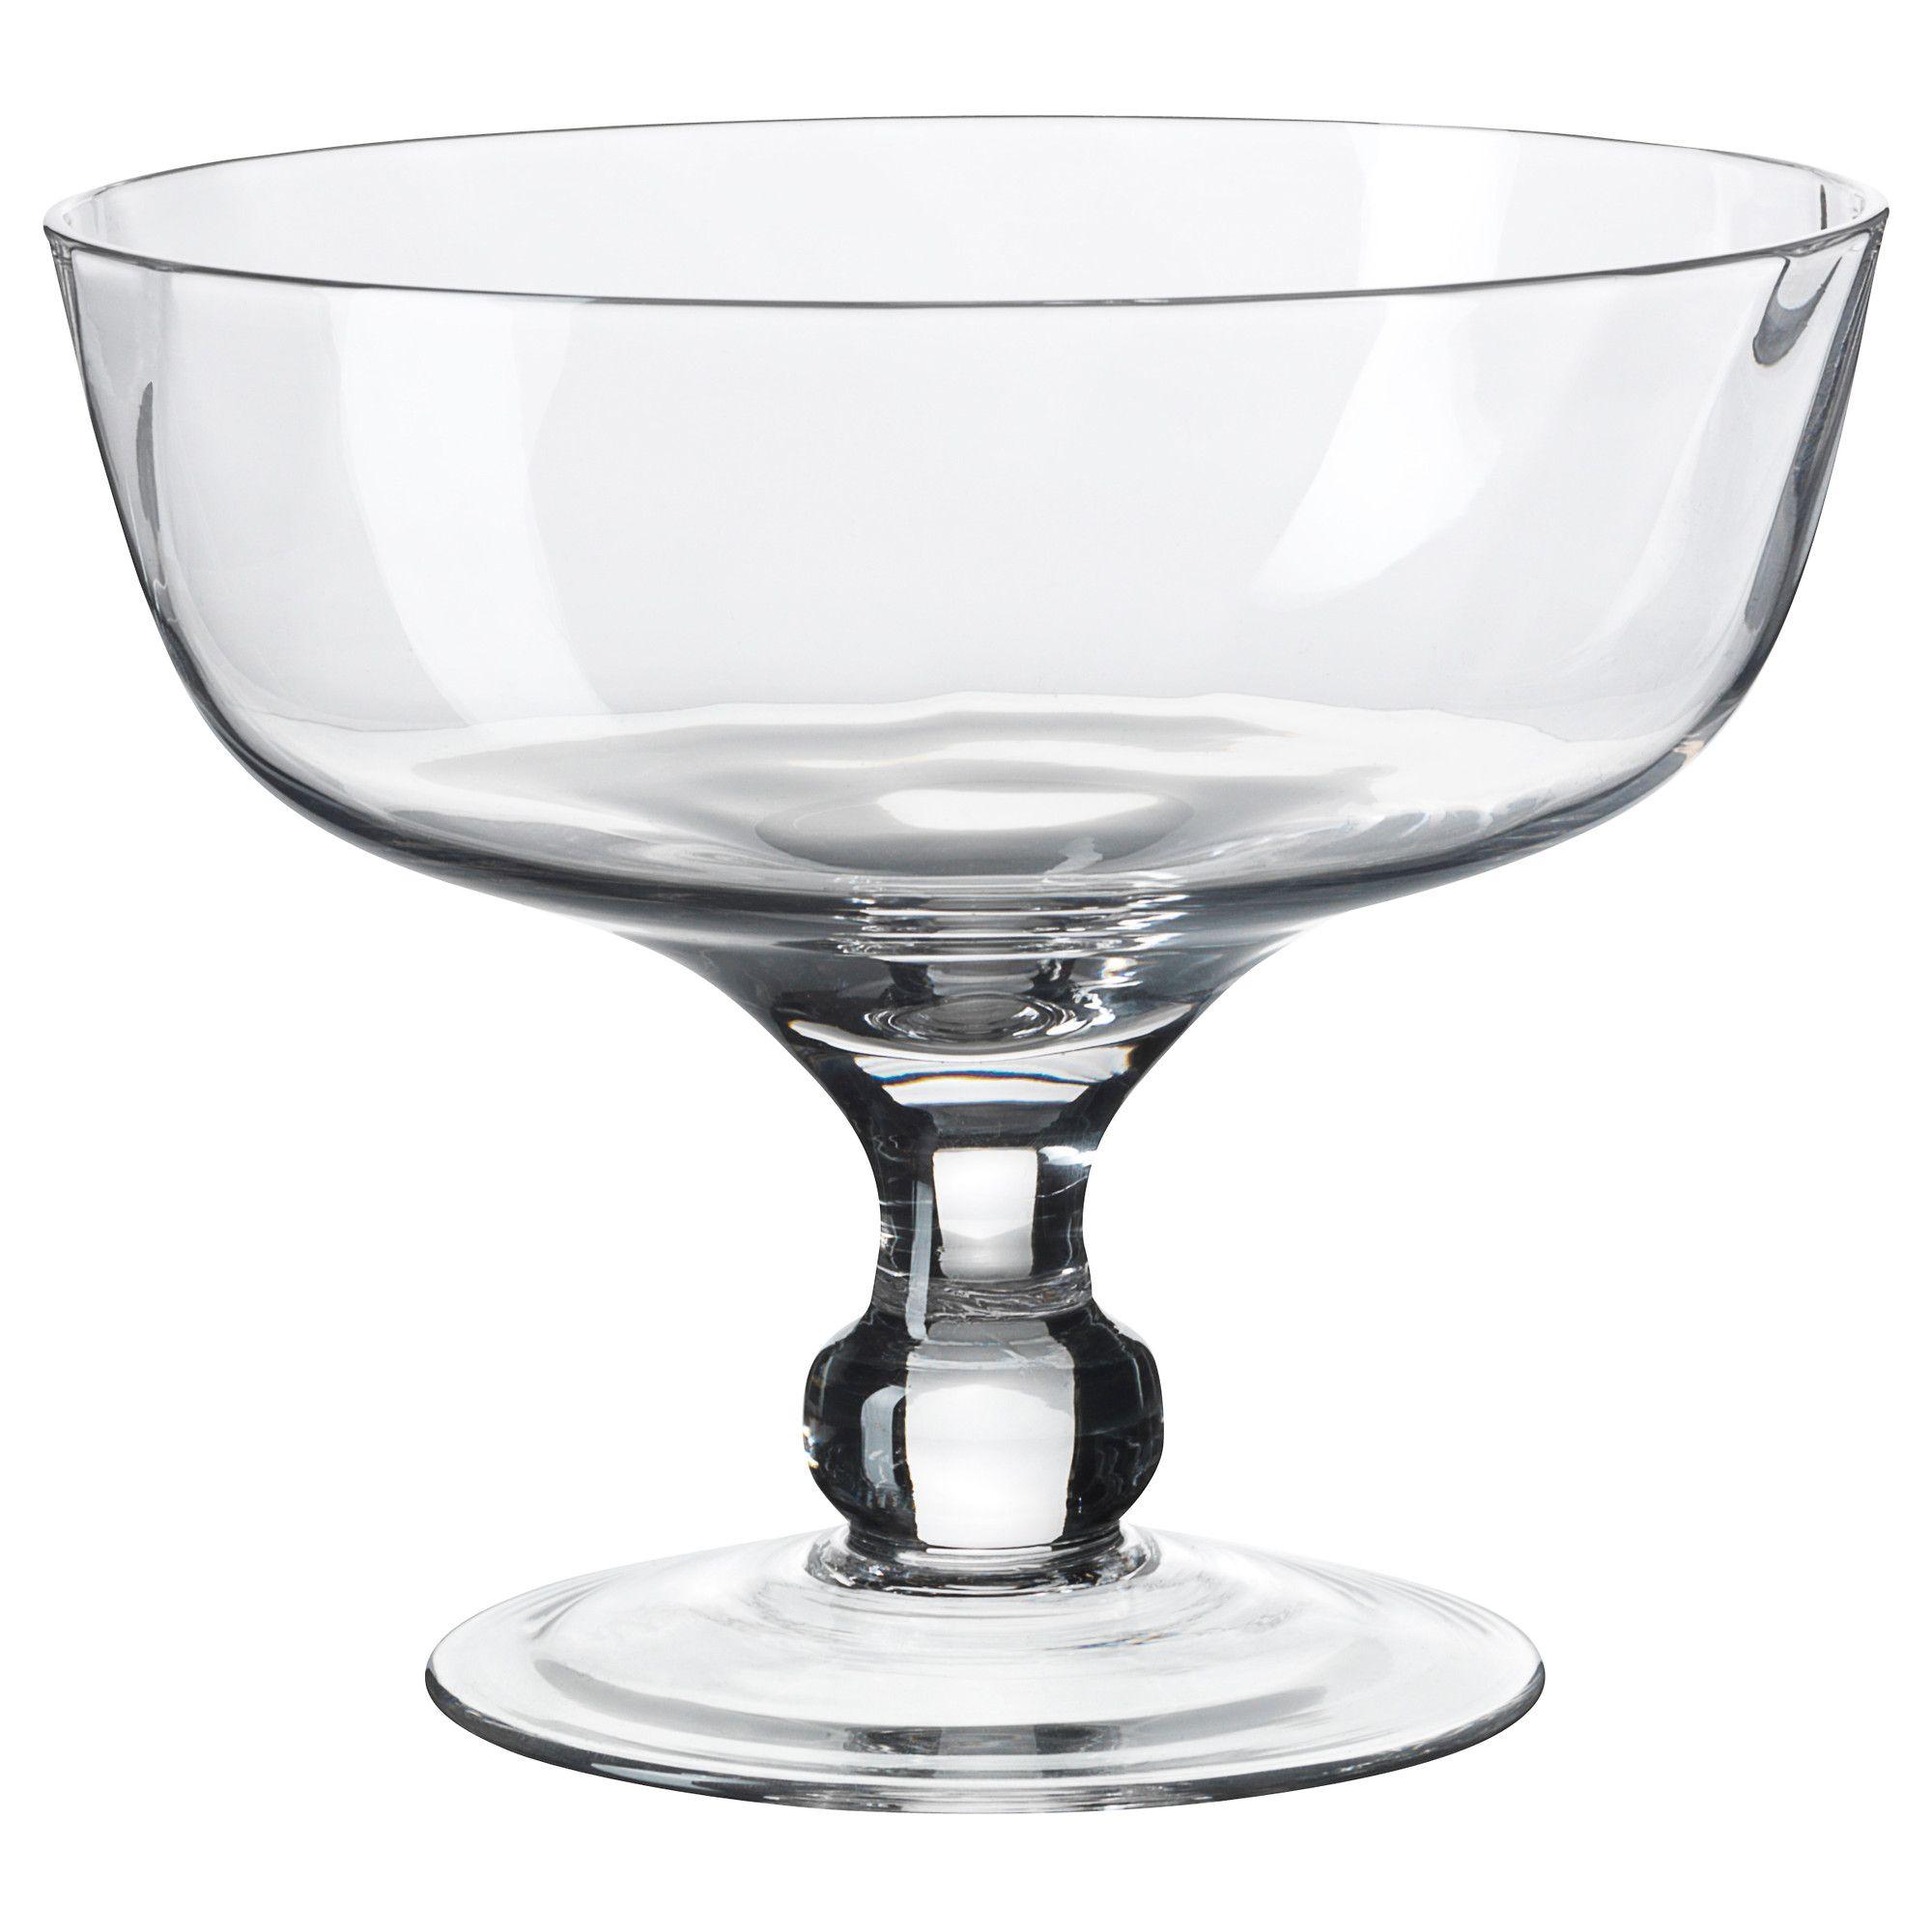 Ikea 365 Glass Clear Glass Tiramisu Bowls And Glasses